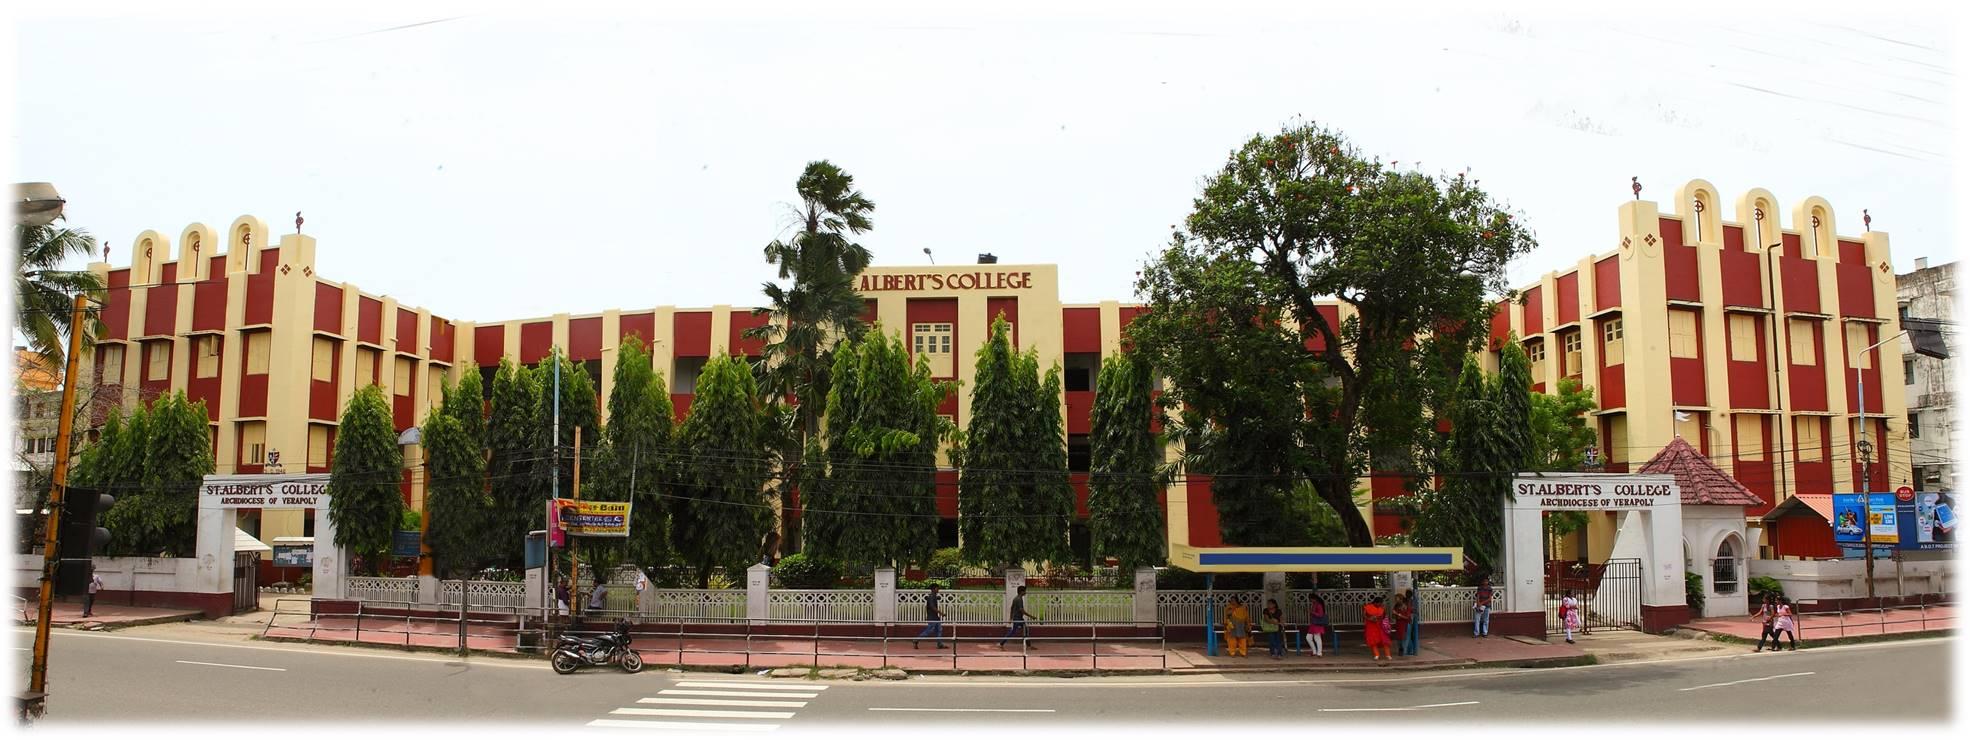 St. Albert's College, Kochi Image